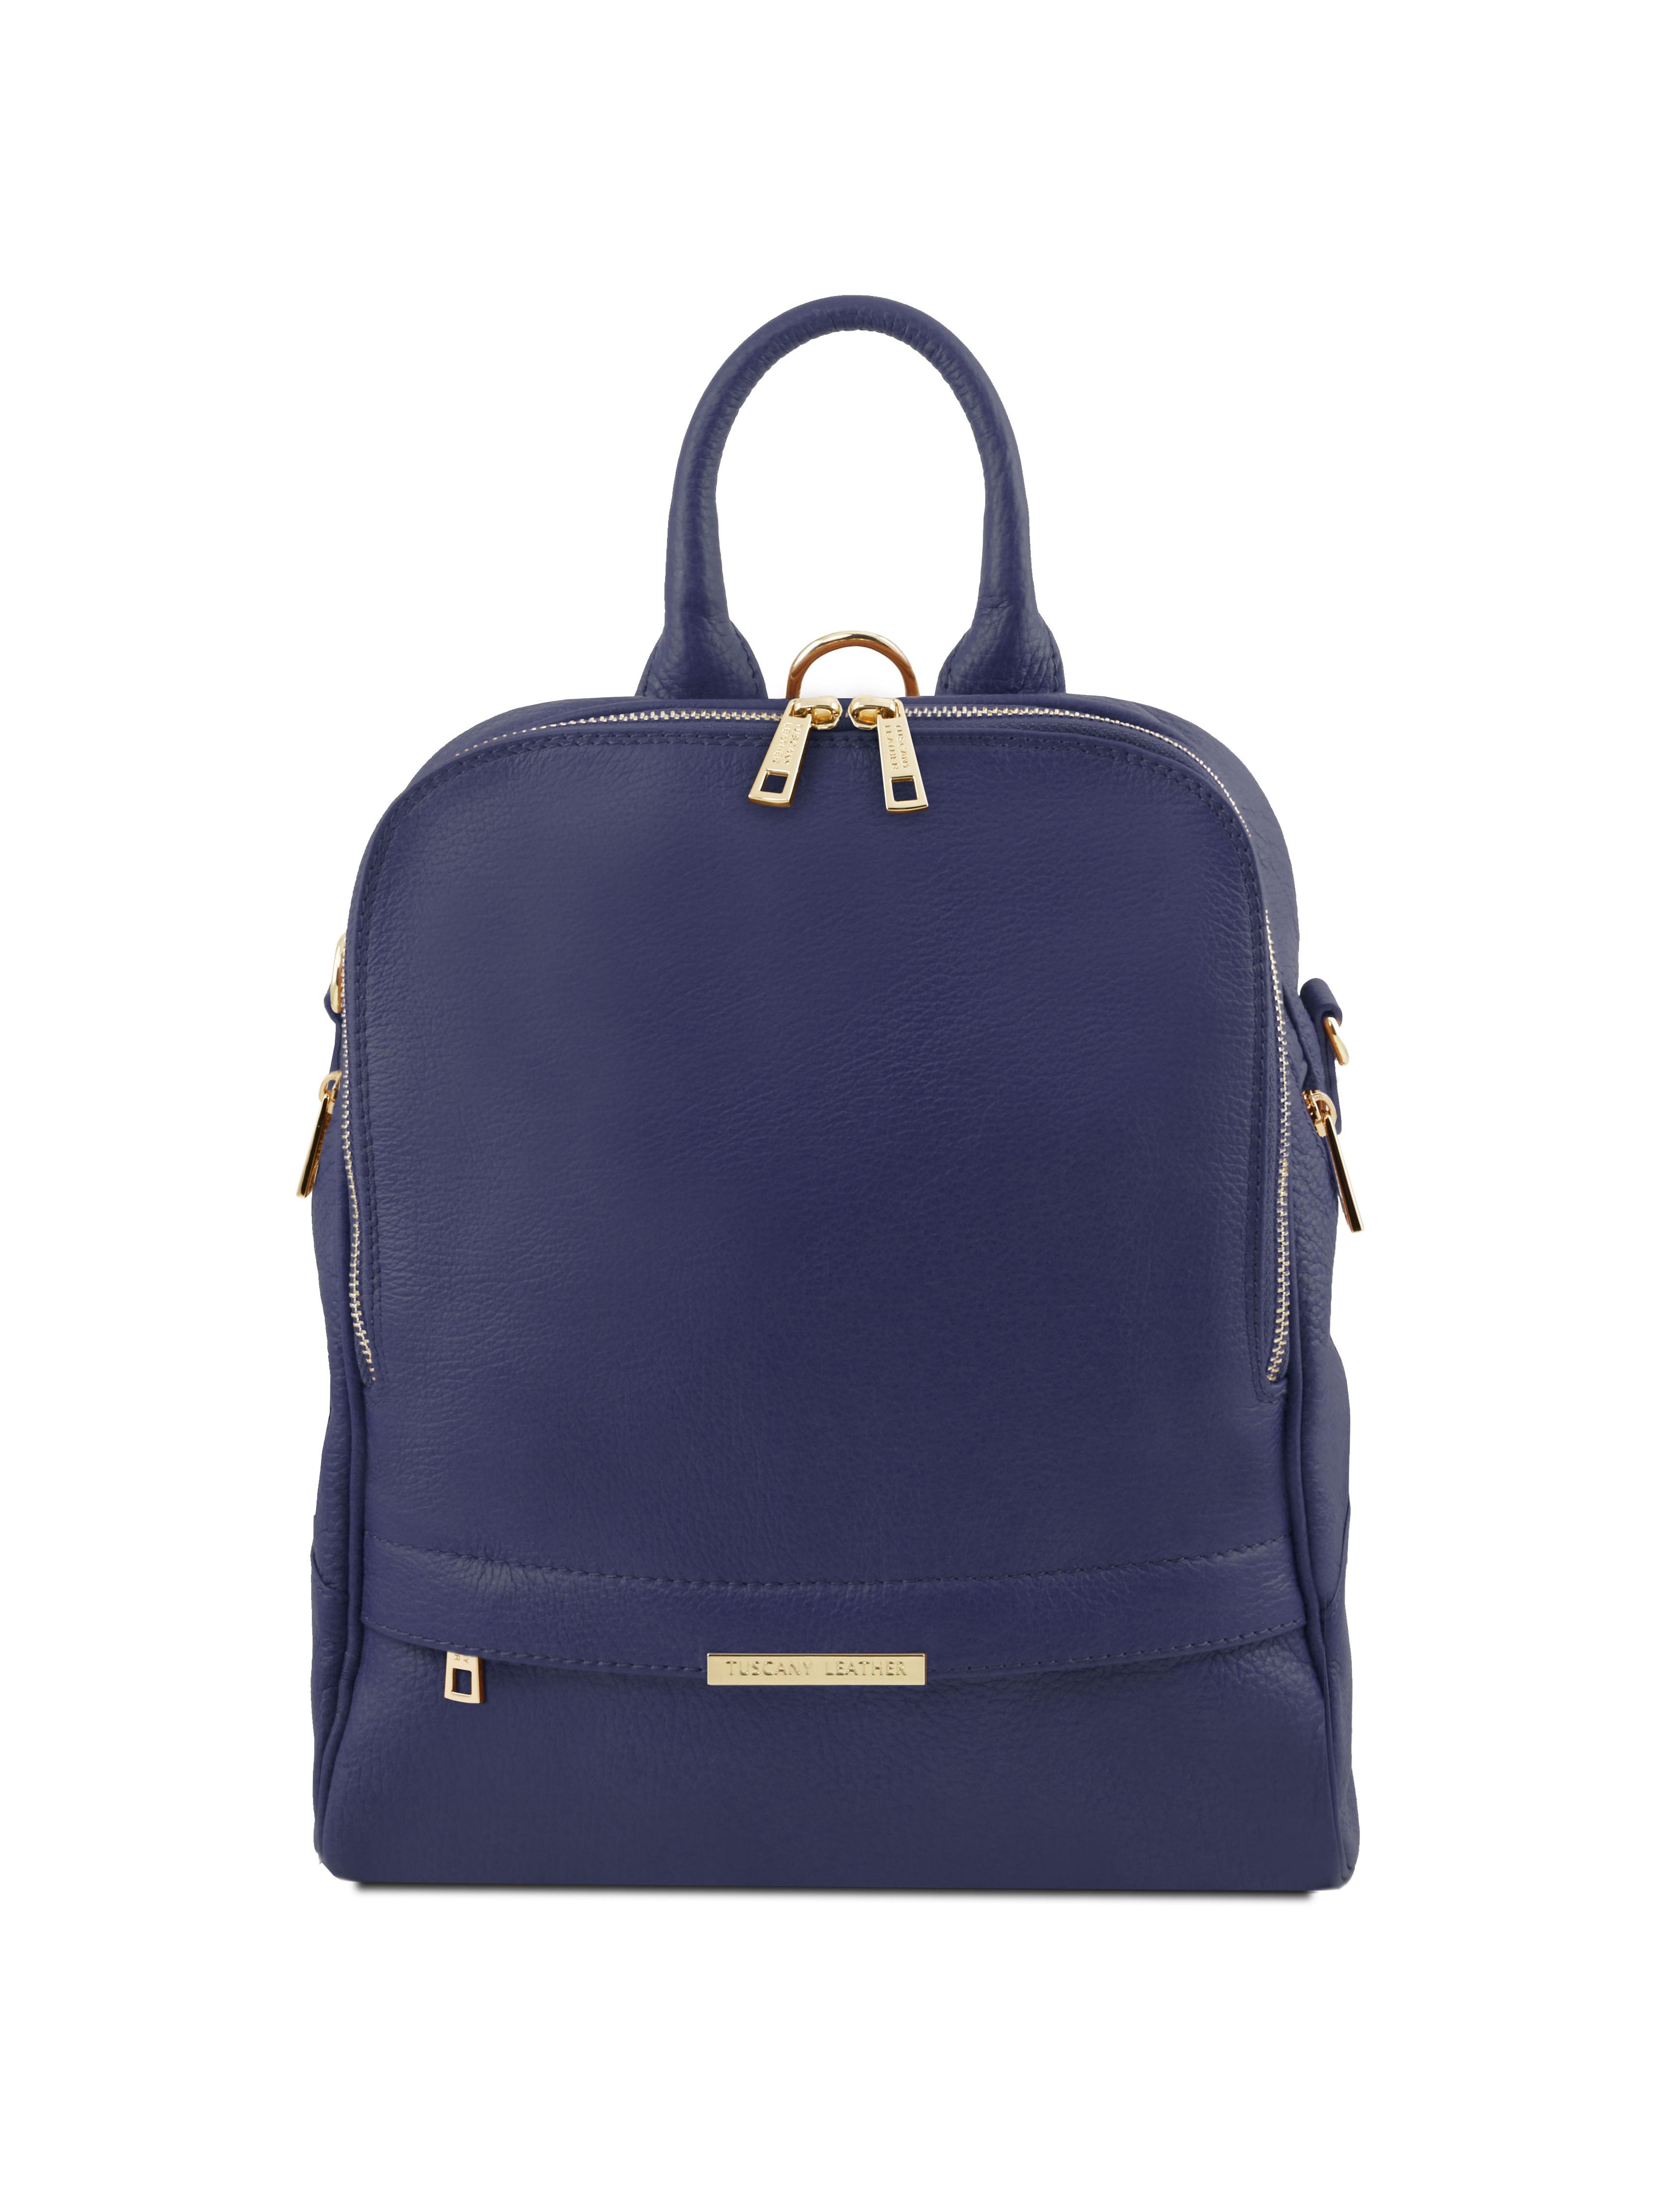 Rucsac dama din piele naturala Tuscany Leather, albastru inchis, TL Bag